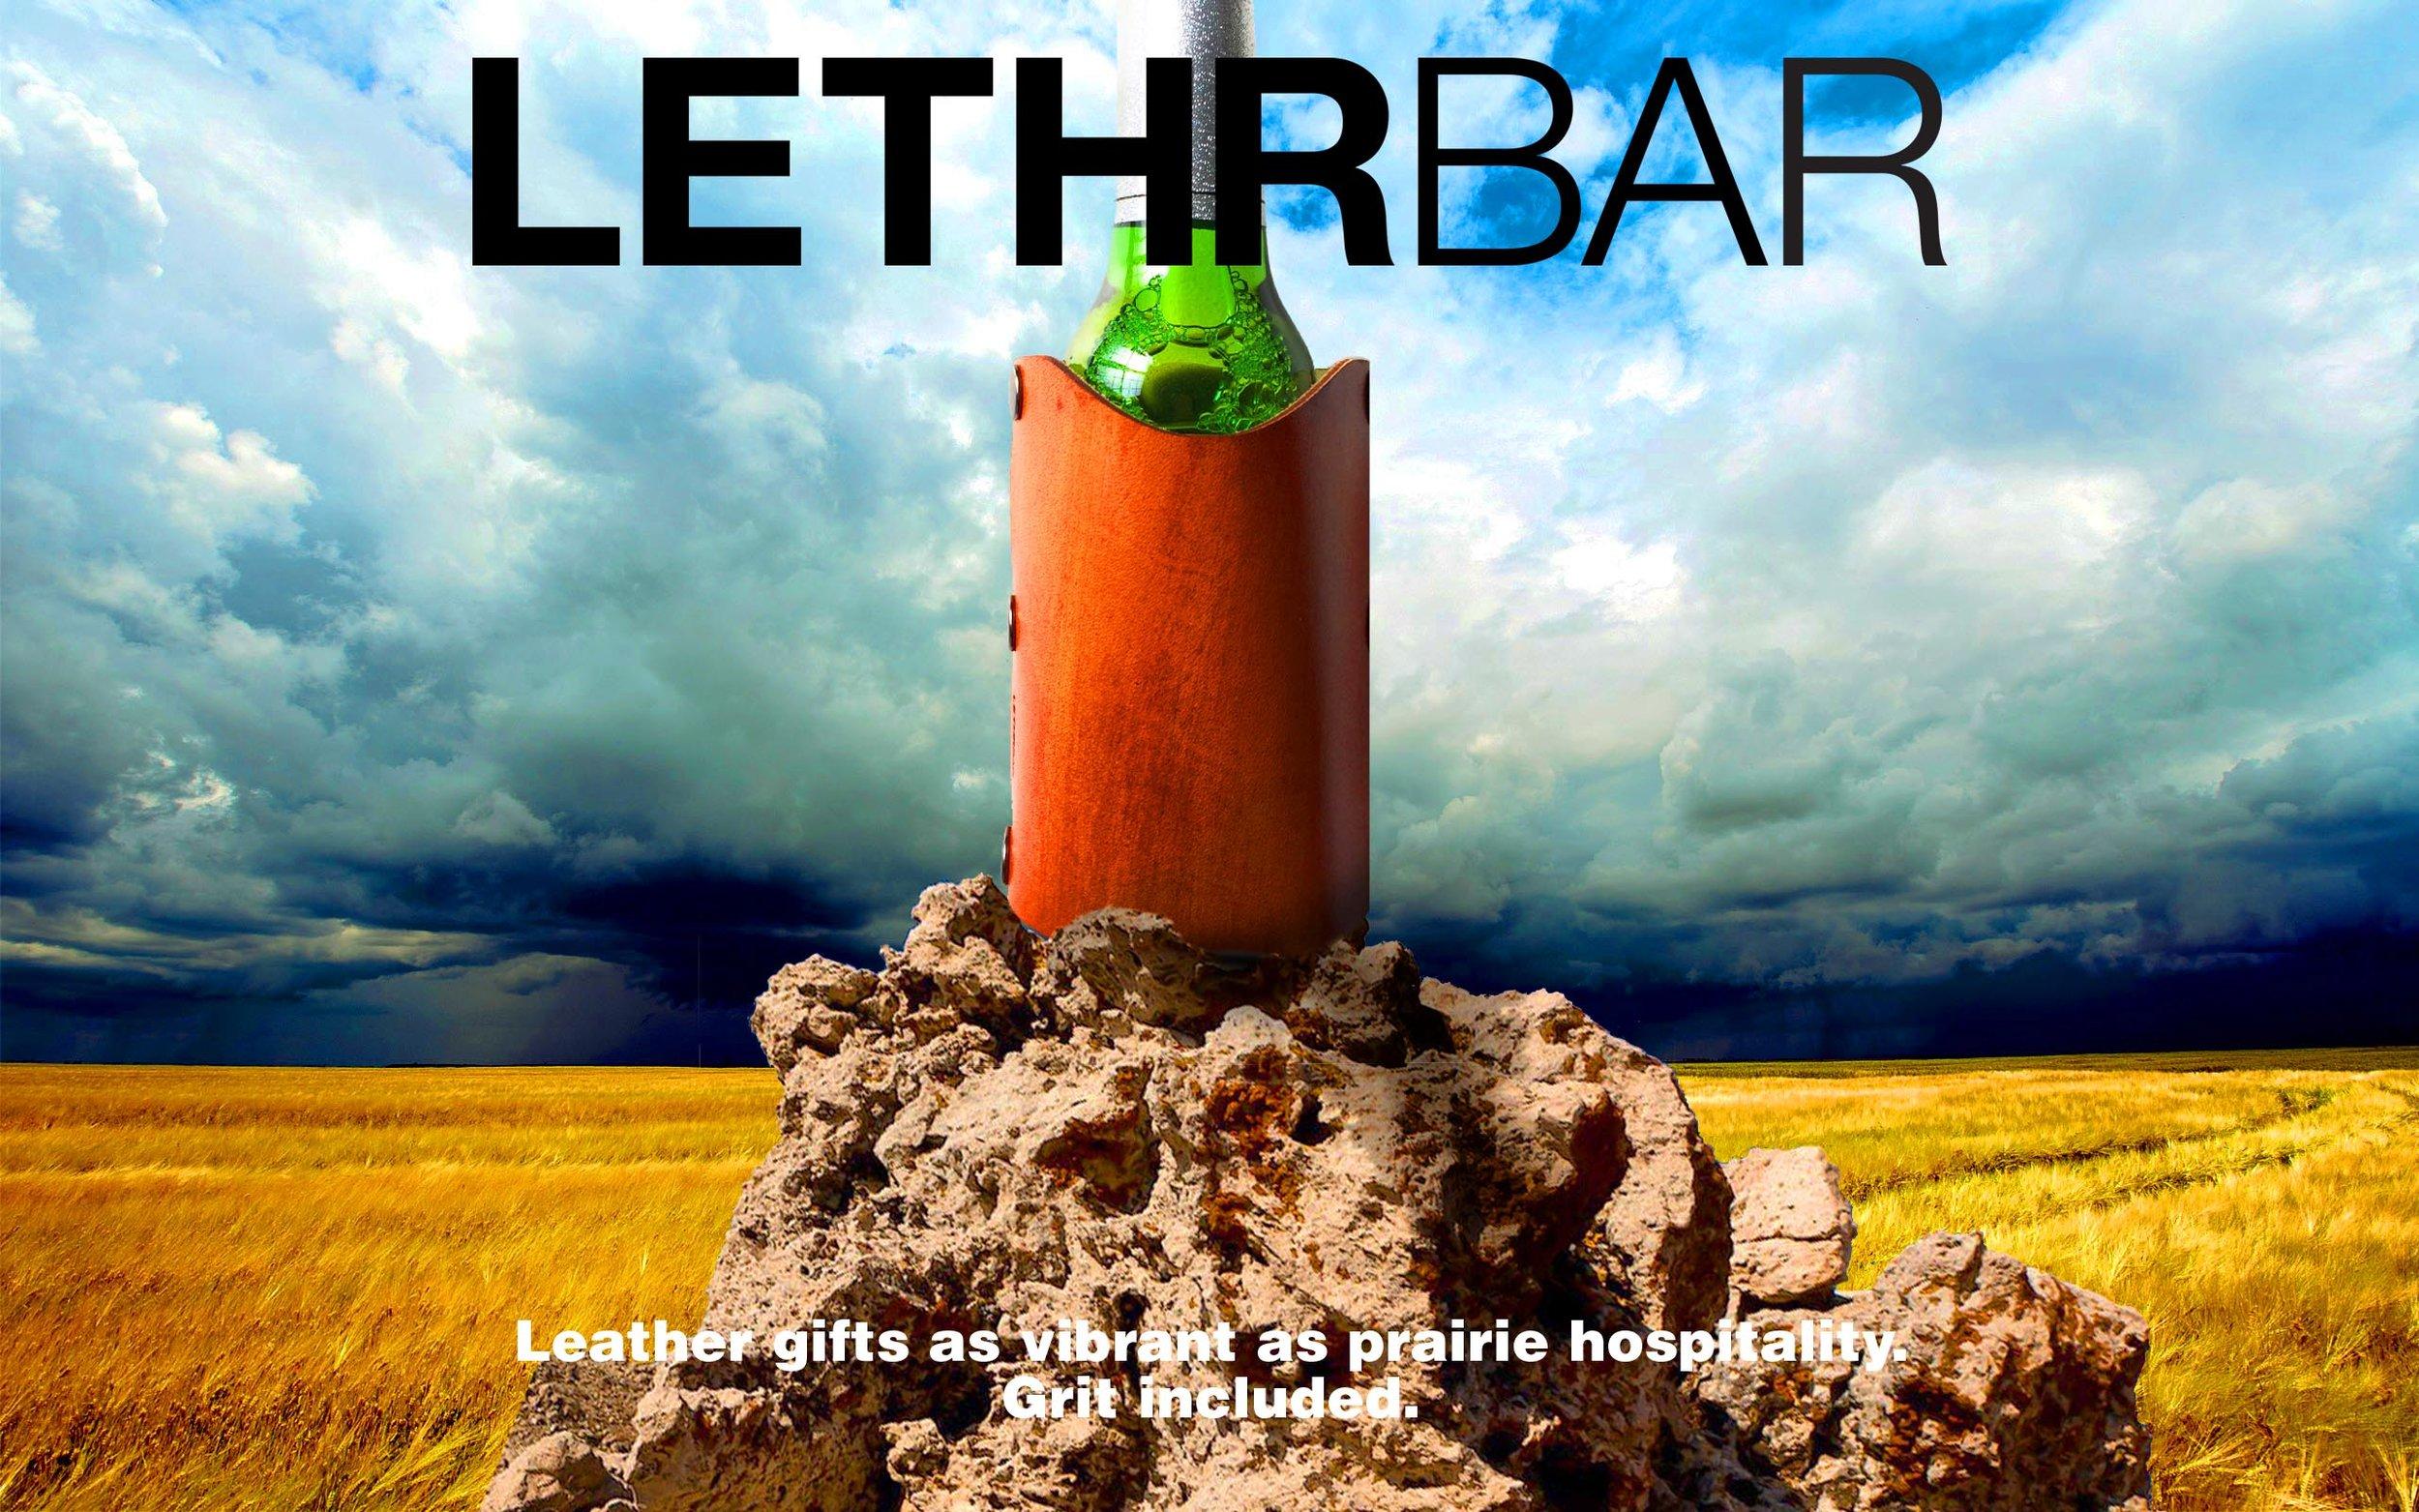 LETHRBAR Holster.jpg